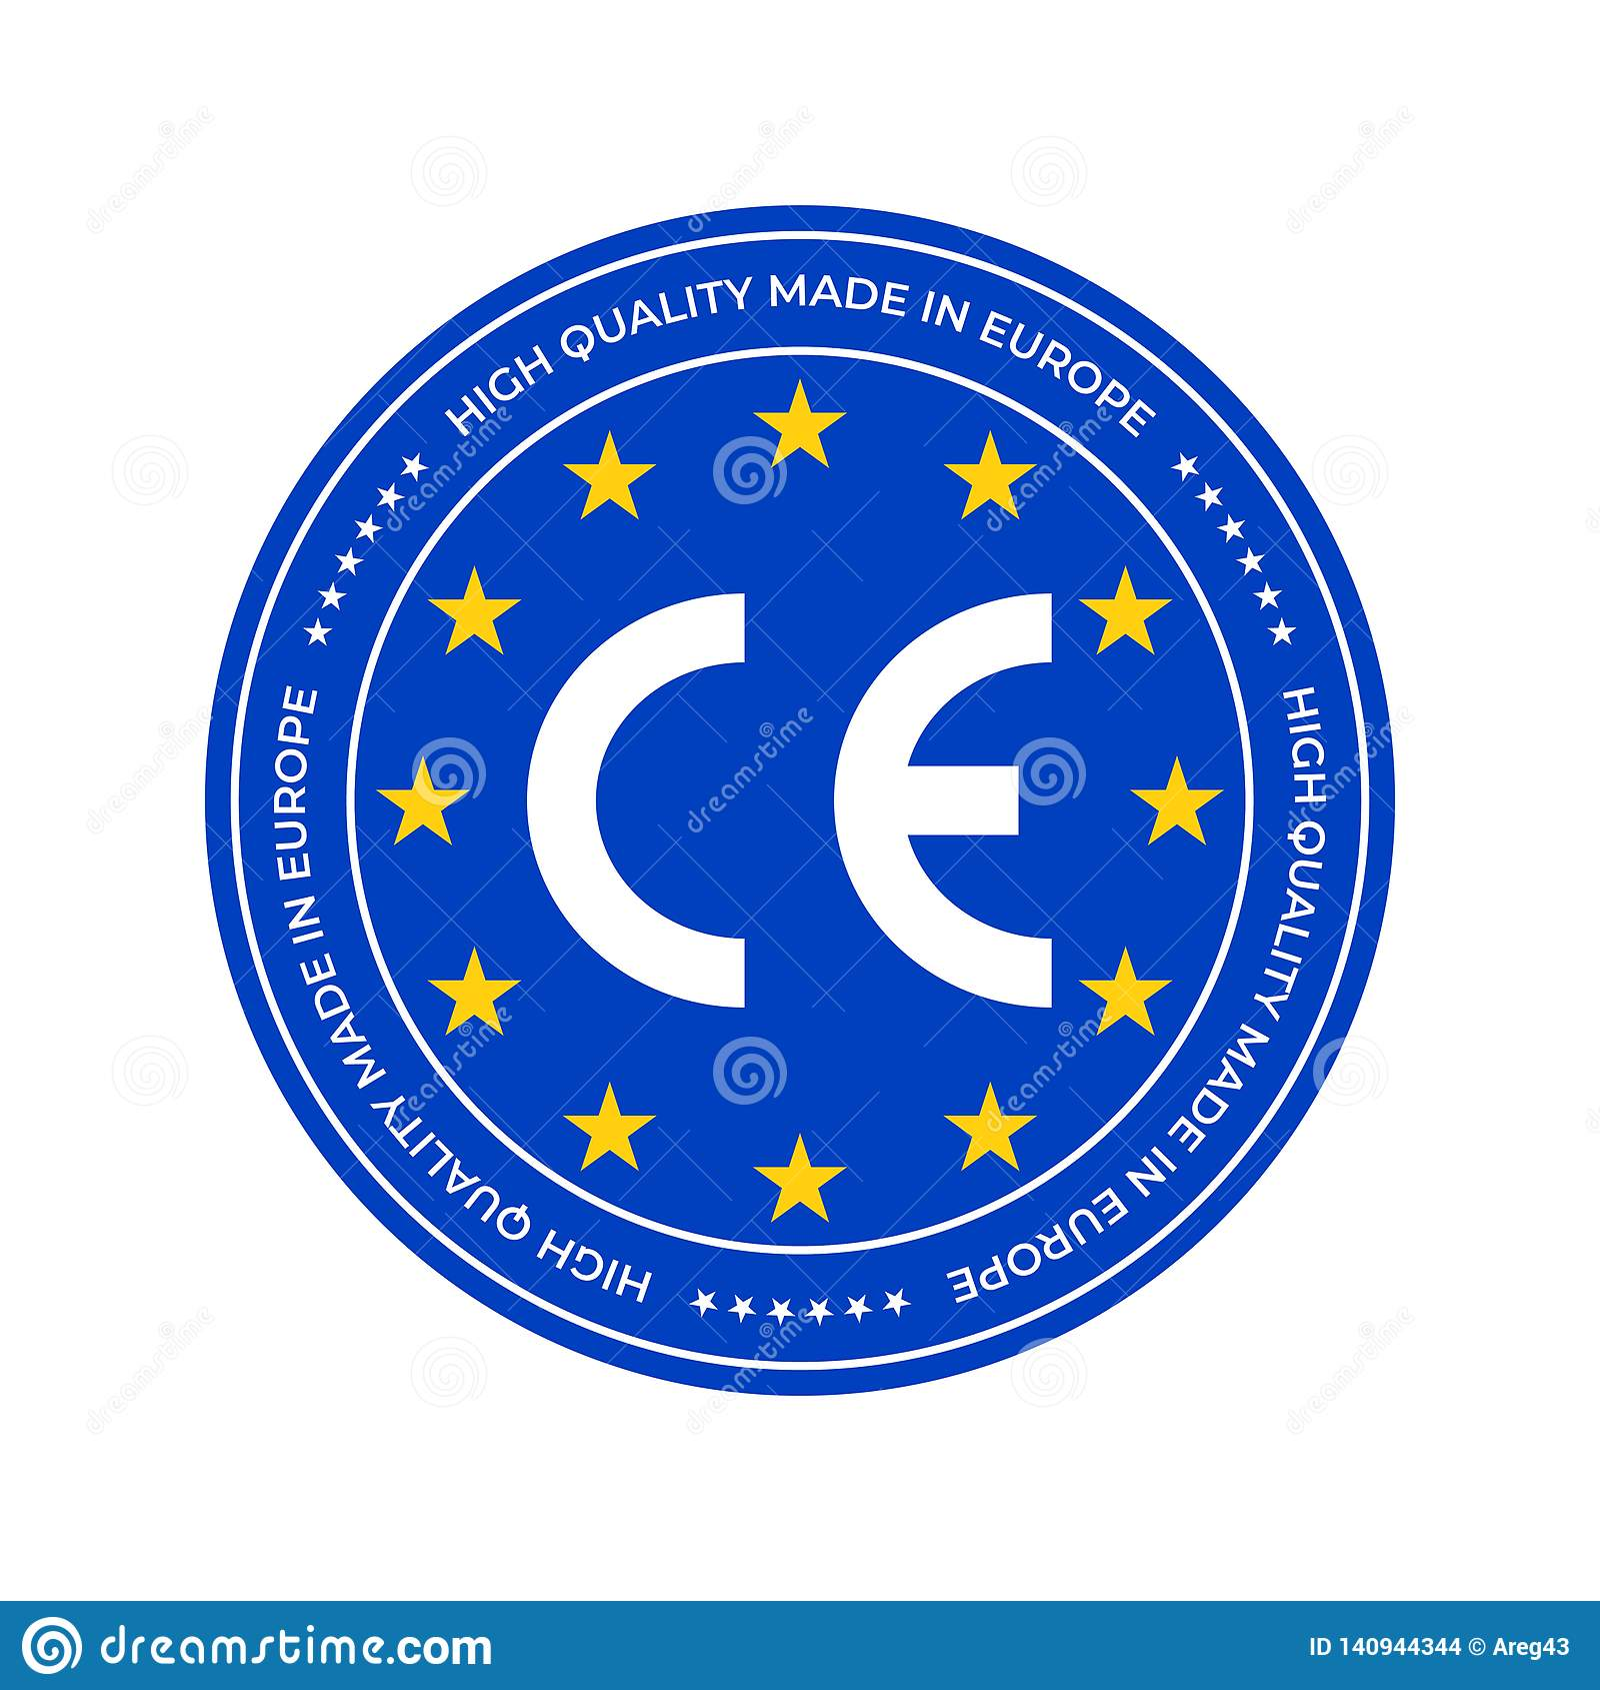 CE Marking Label Or European Conformity Certification Mark